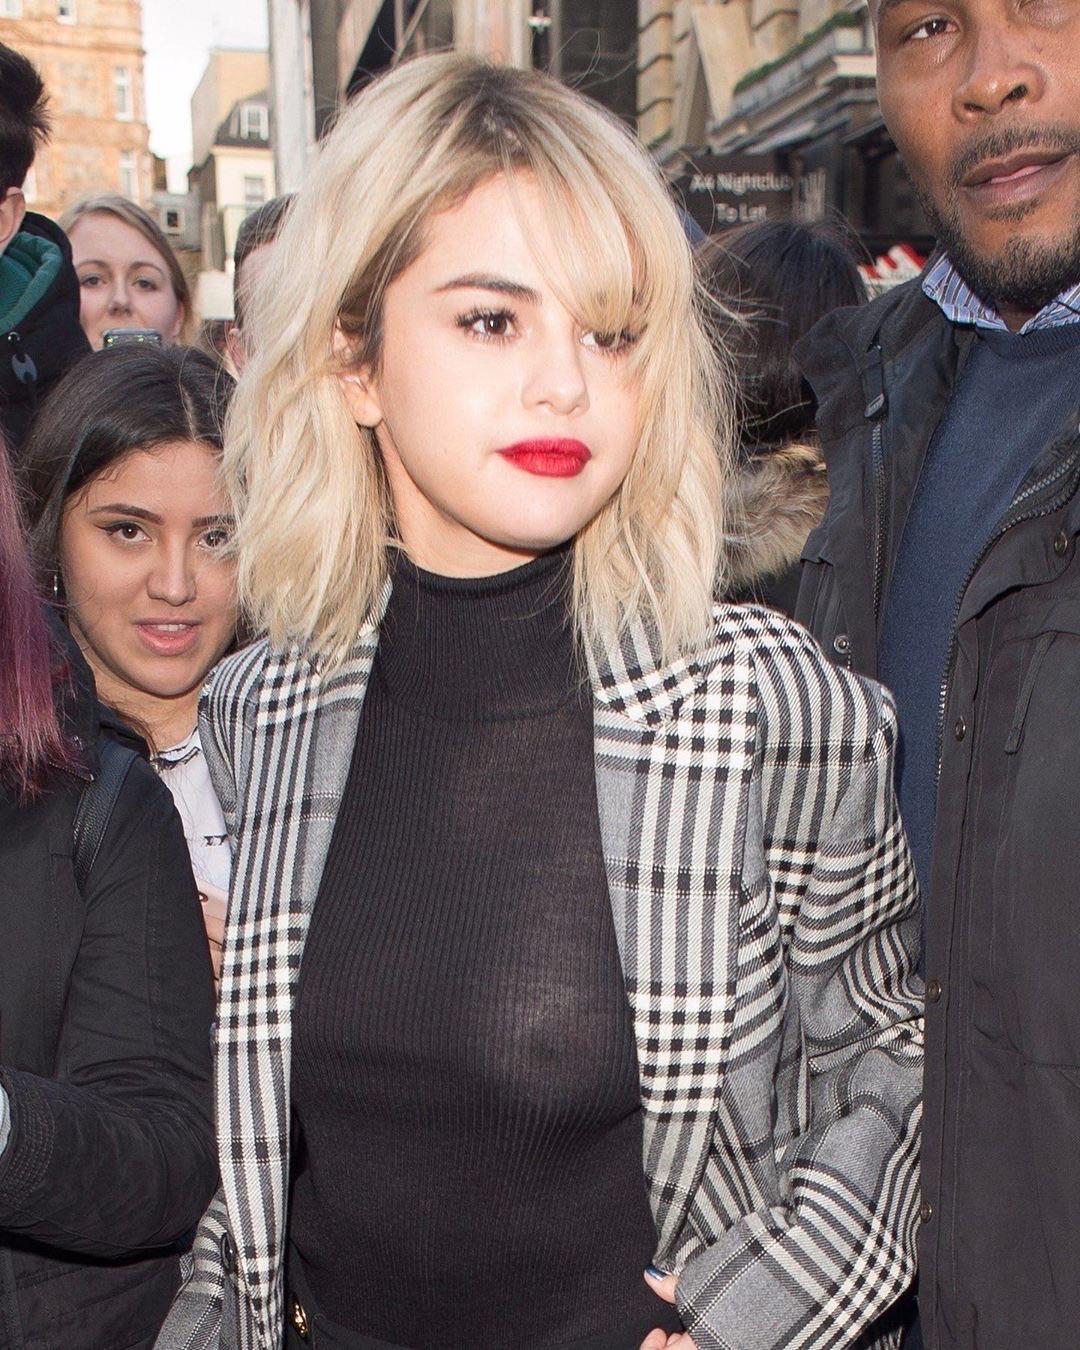 I Love No-bra Selena Gomez!